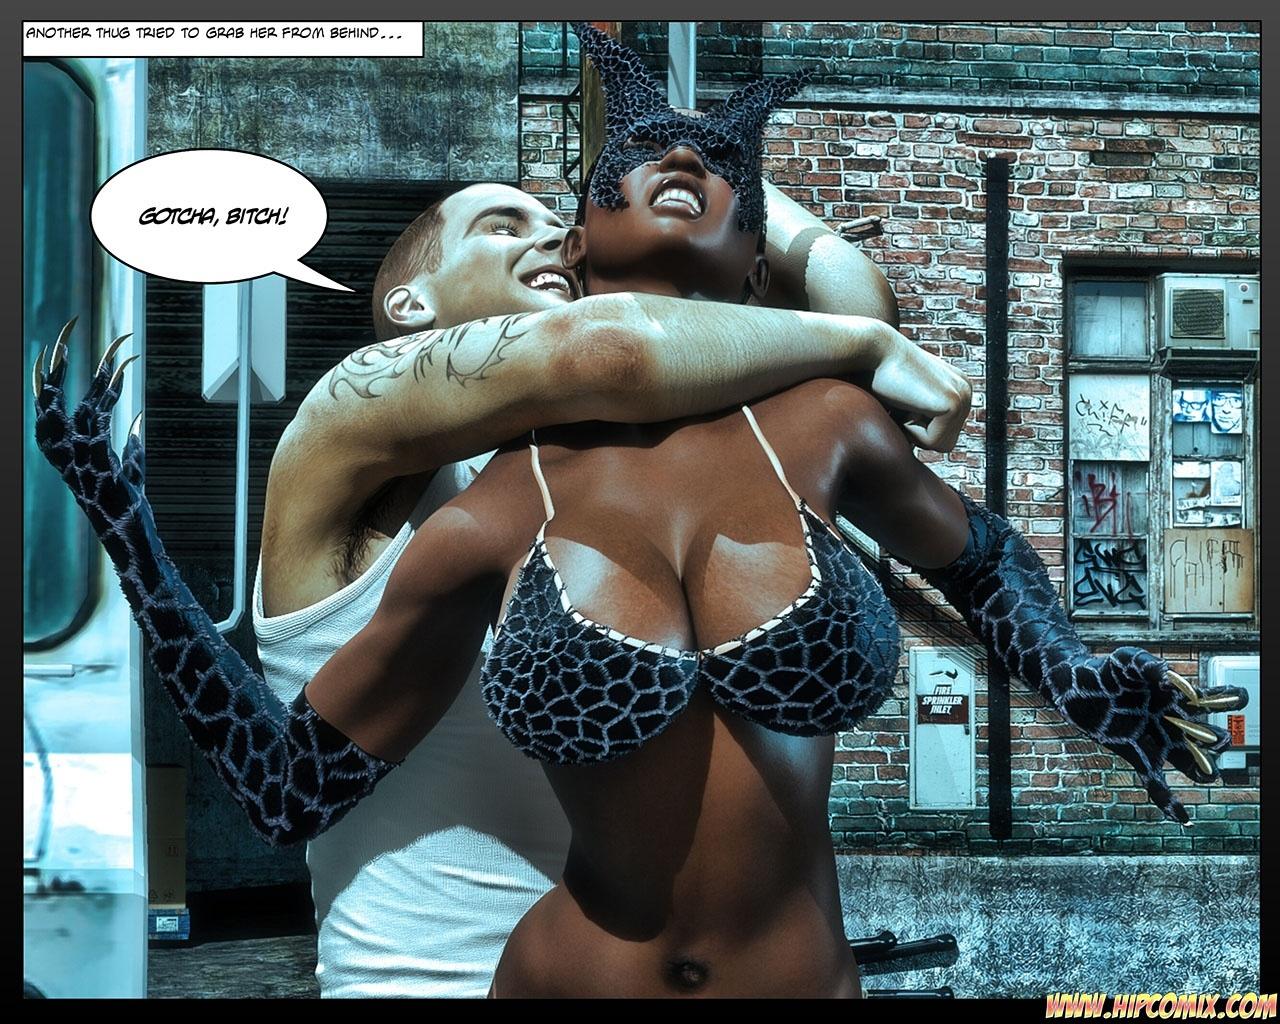 Panther-Girl-13 14 free sex comic